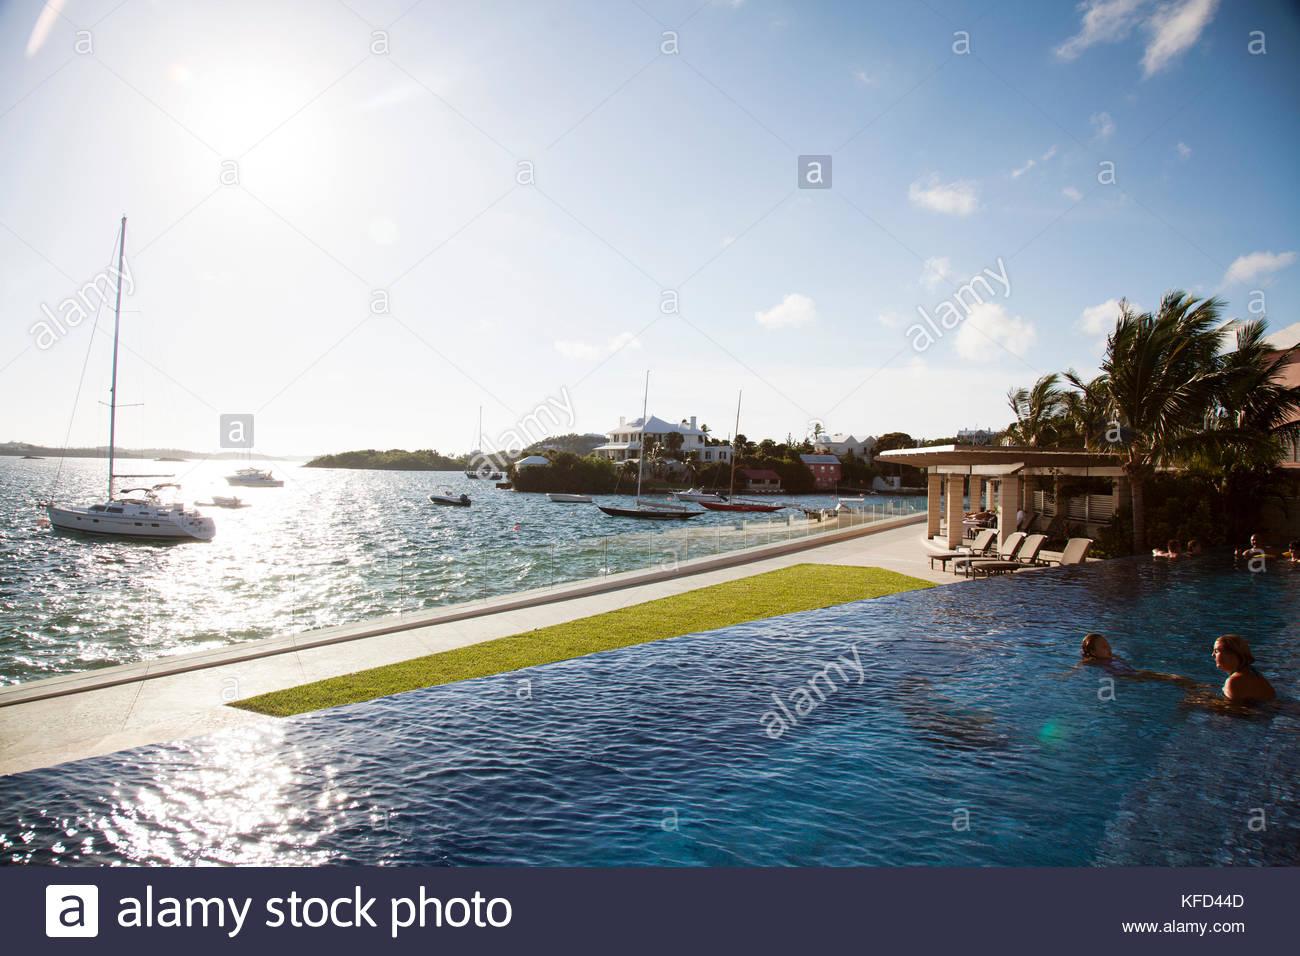 BERMUDA The Infinity Pool at the Hamilton Princess Beach Club 1300x956